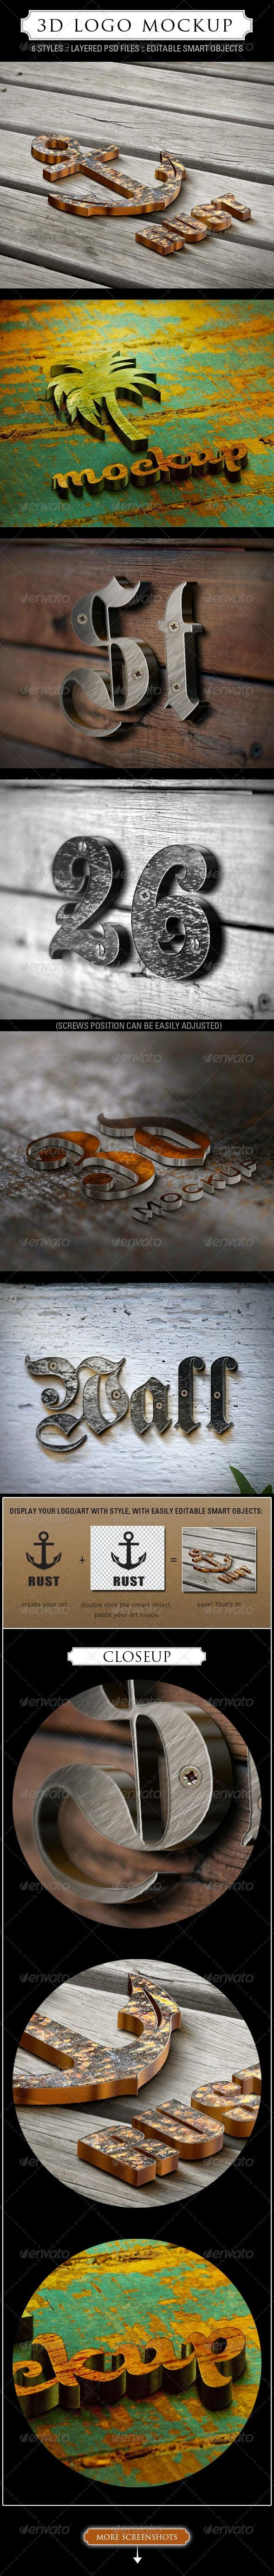 3D Logo Mockup - 6 Styles - Logo Product Mock-Ups